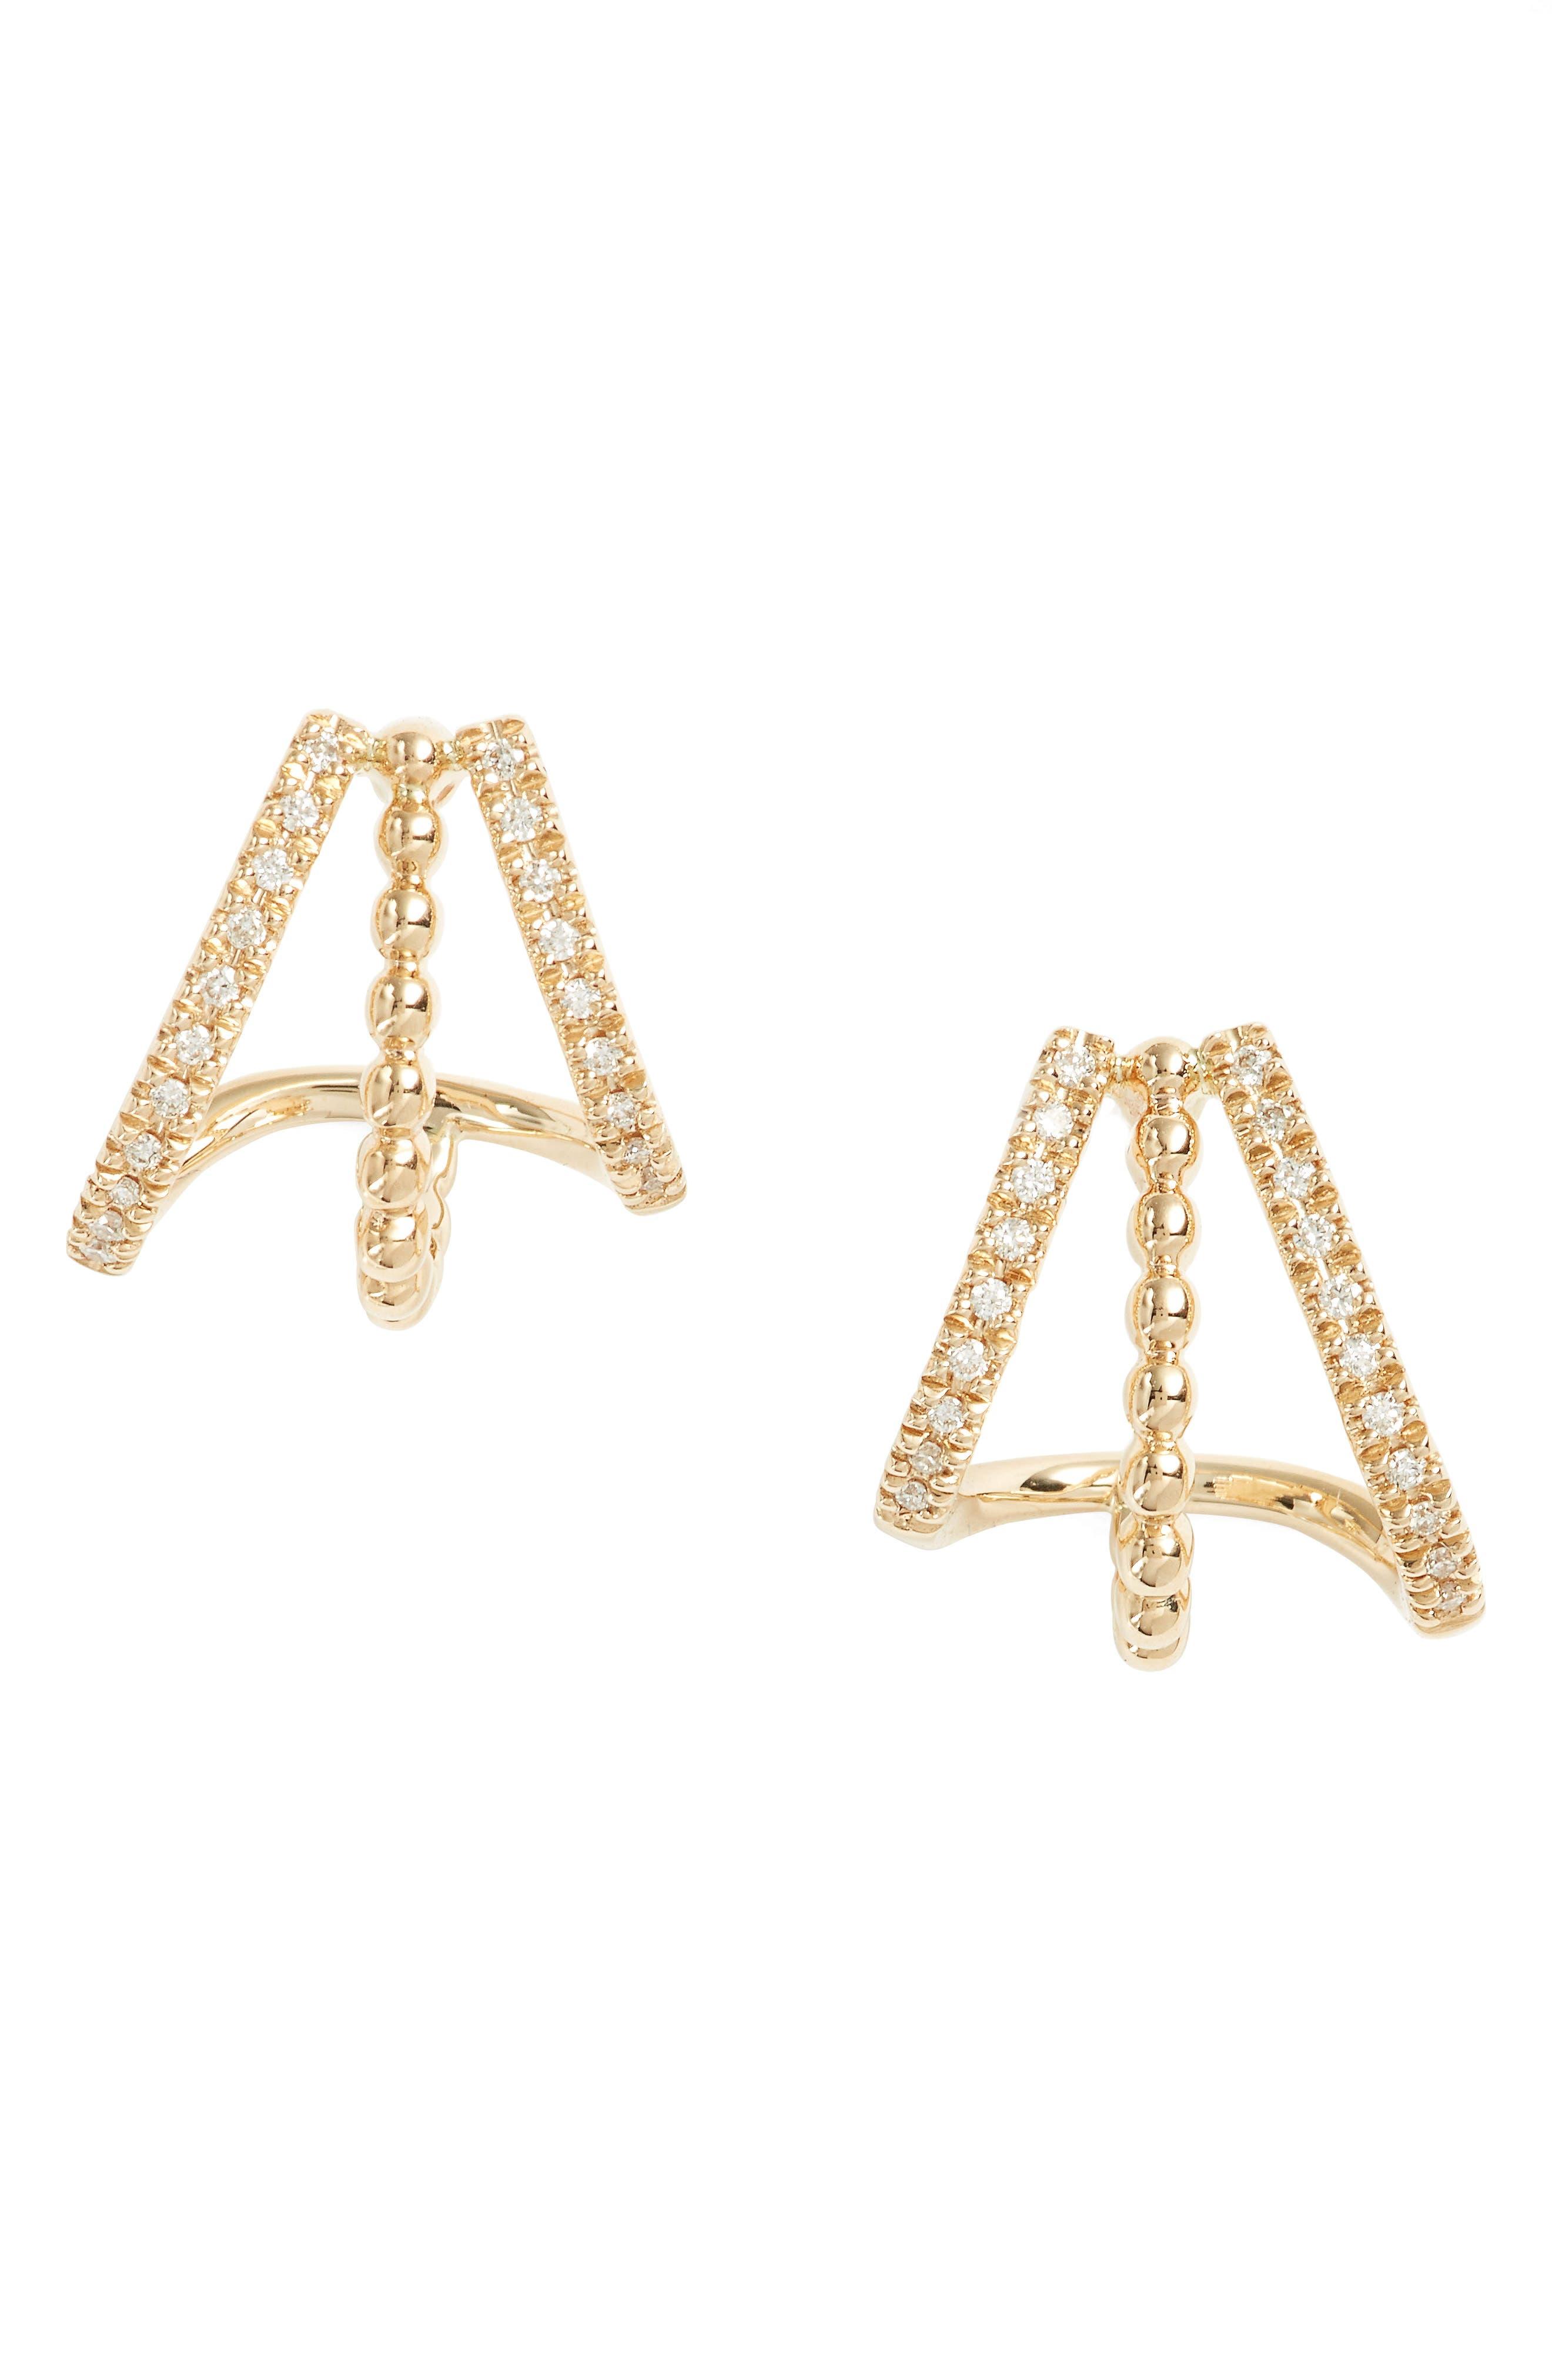 Dana Rebecca Designs Poppy Rae Diamond 3-Row Stud Earrings